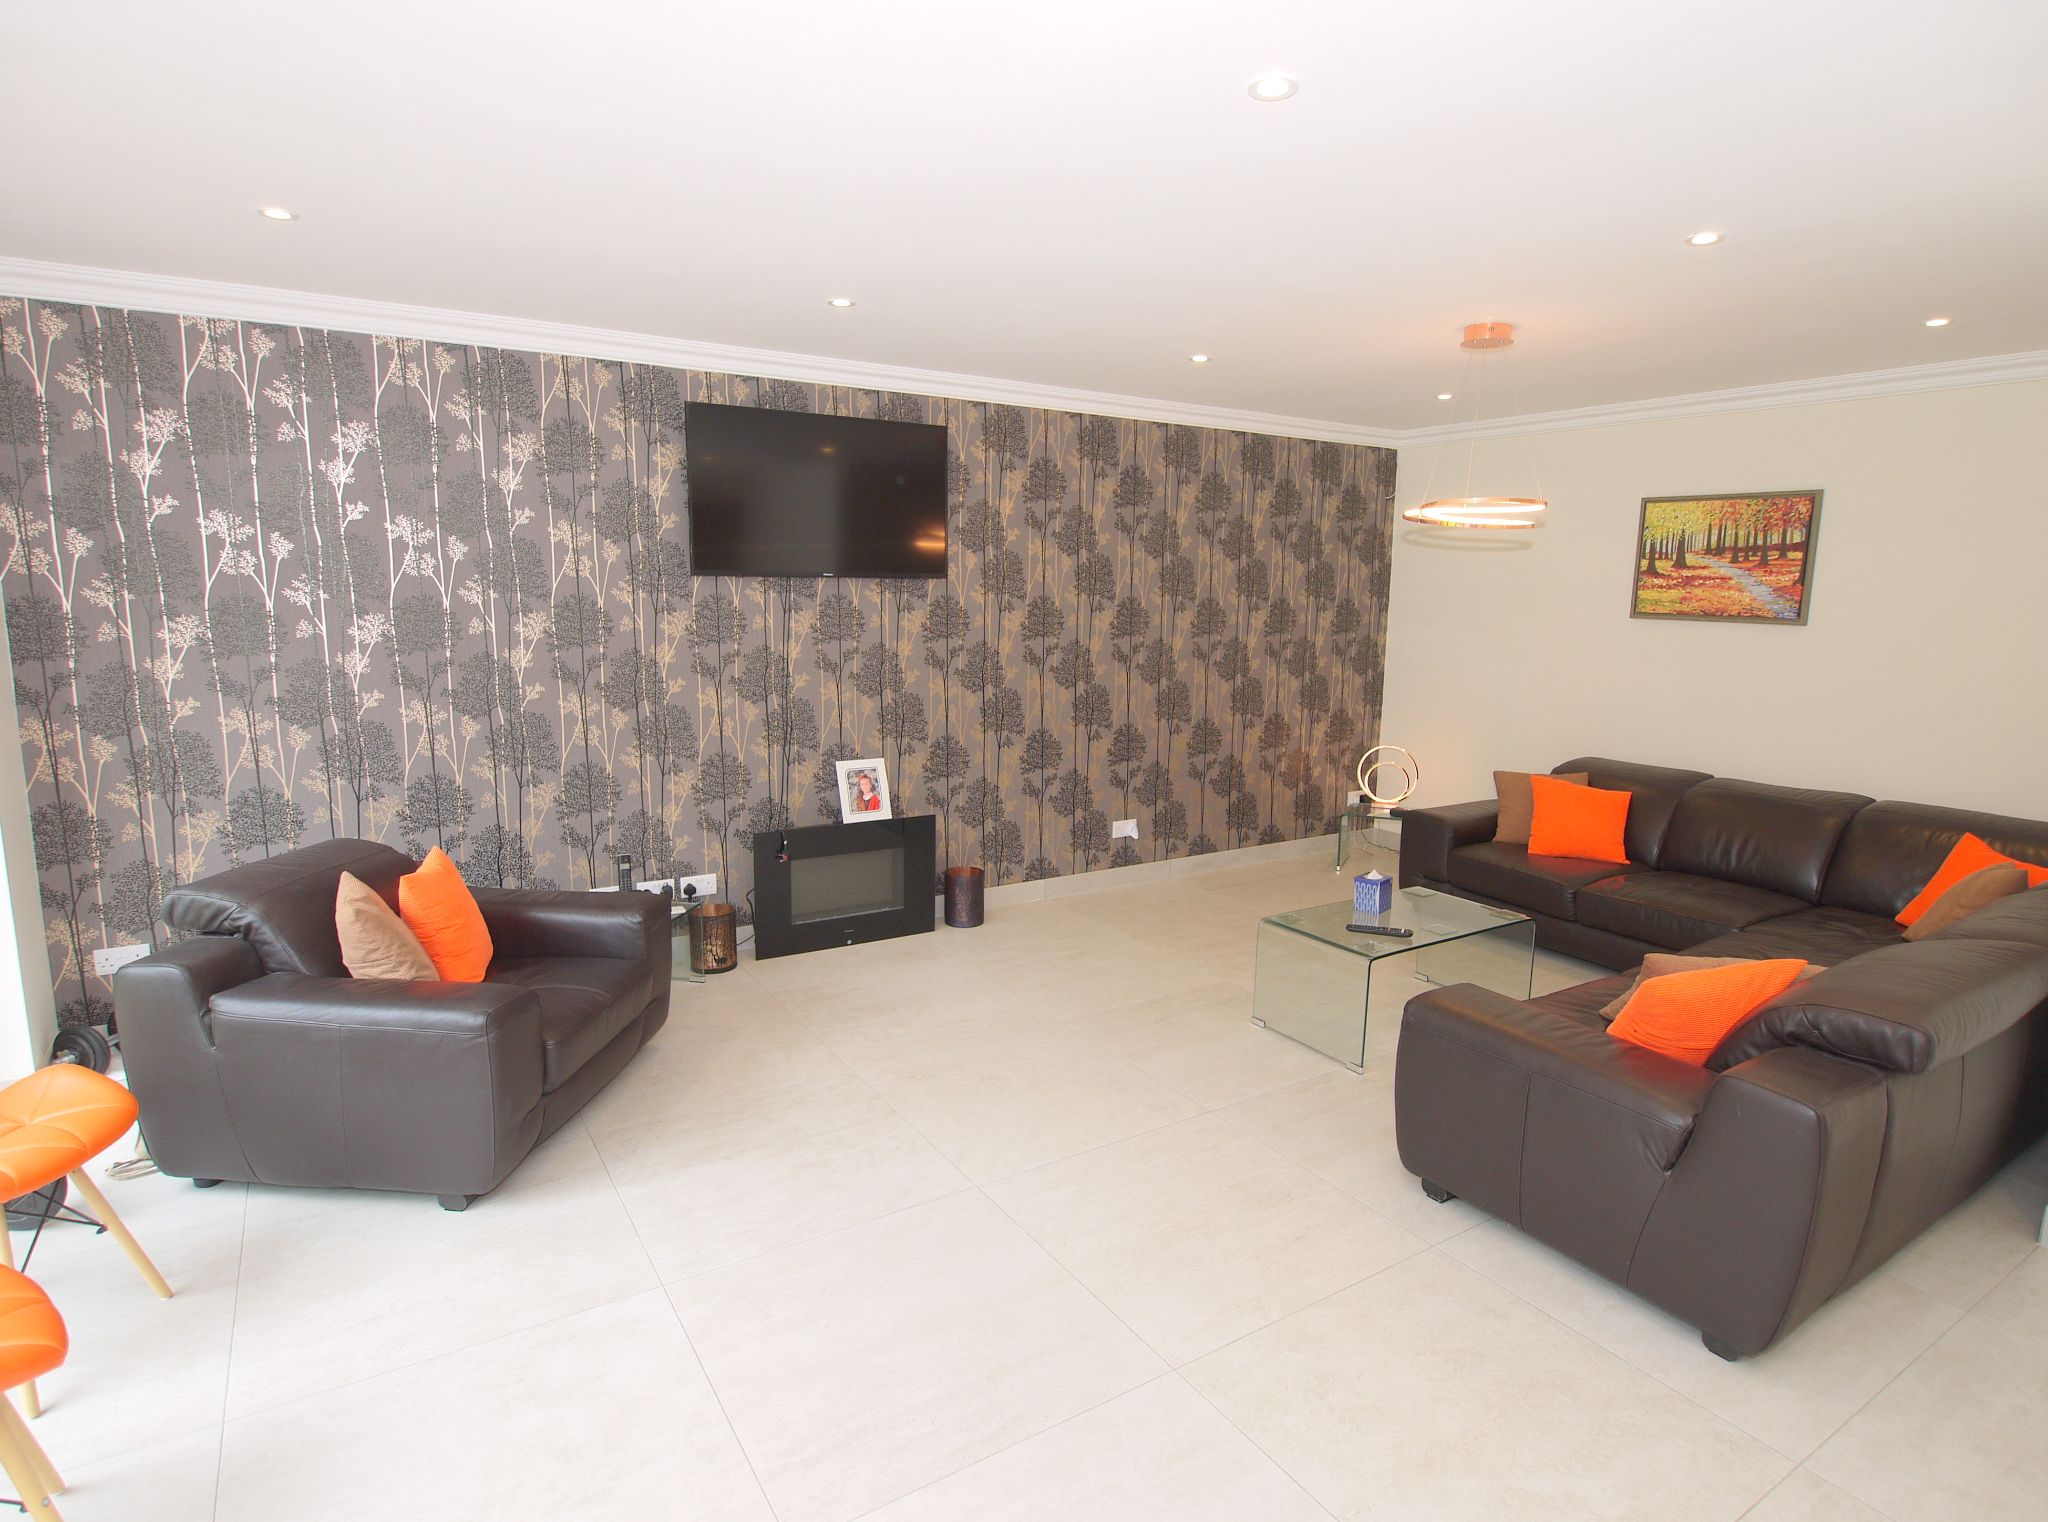 5 bedroom detached house Sold in Sevenoaks - Photograph 4